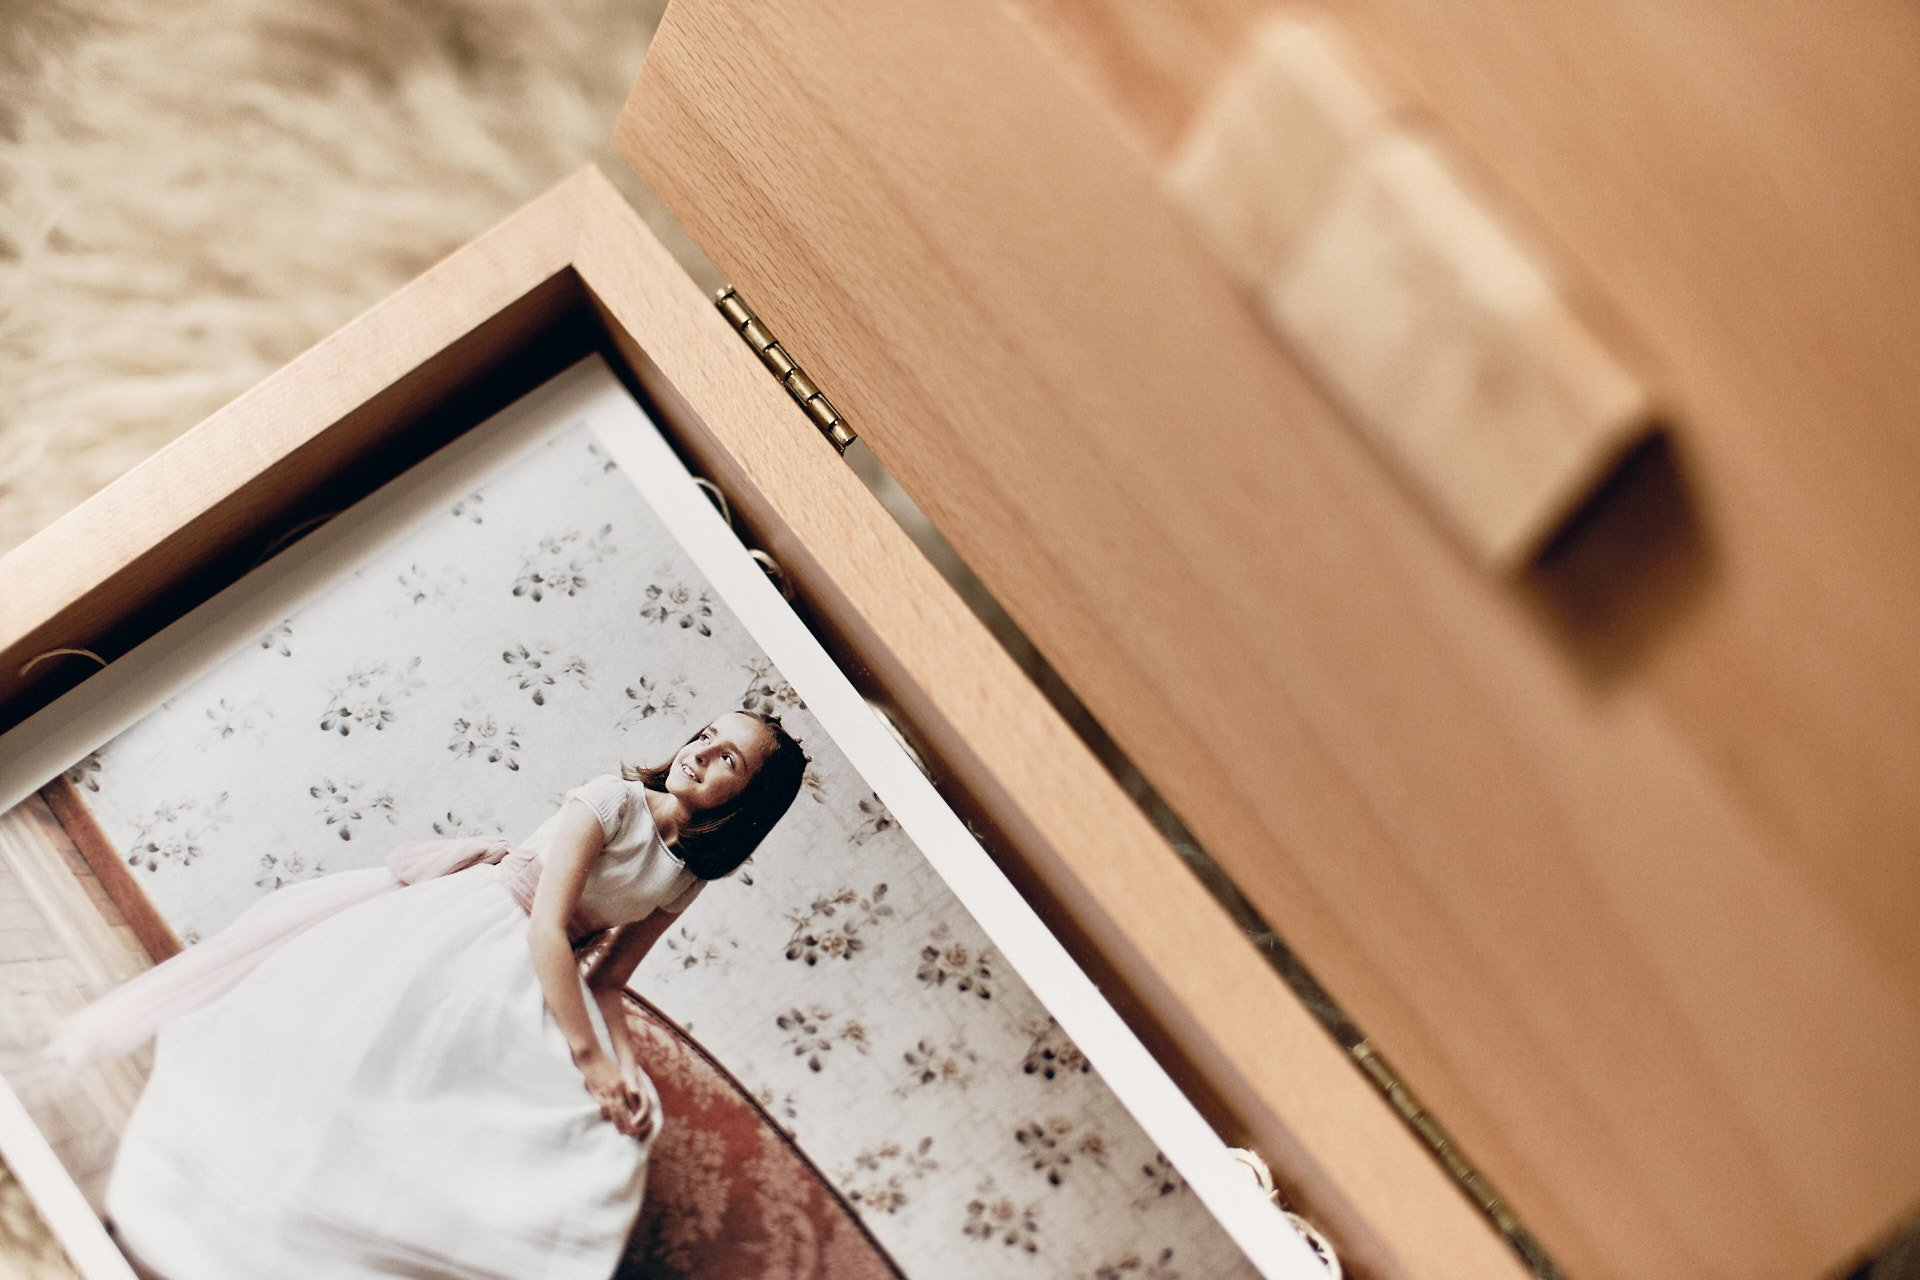 fotografo documental caja de madera con fotos impresas de comunion fineart by fabriziomaulella.com